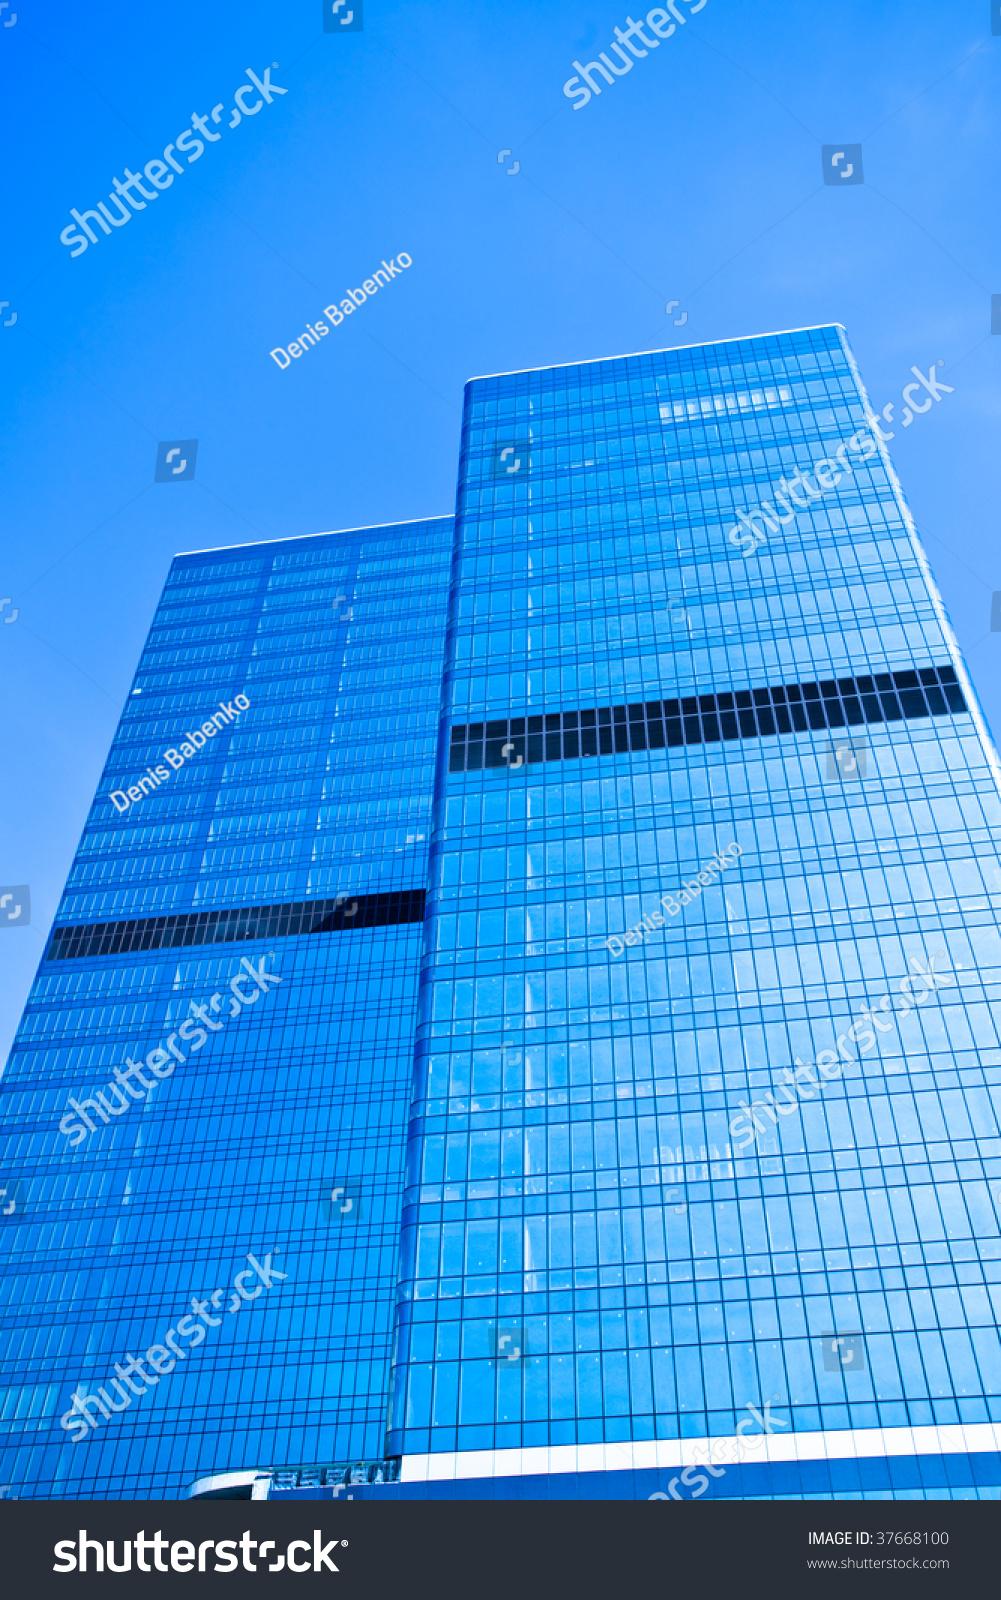 Two Blue Glass Business Skyscraper Stock Photo 37668100